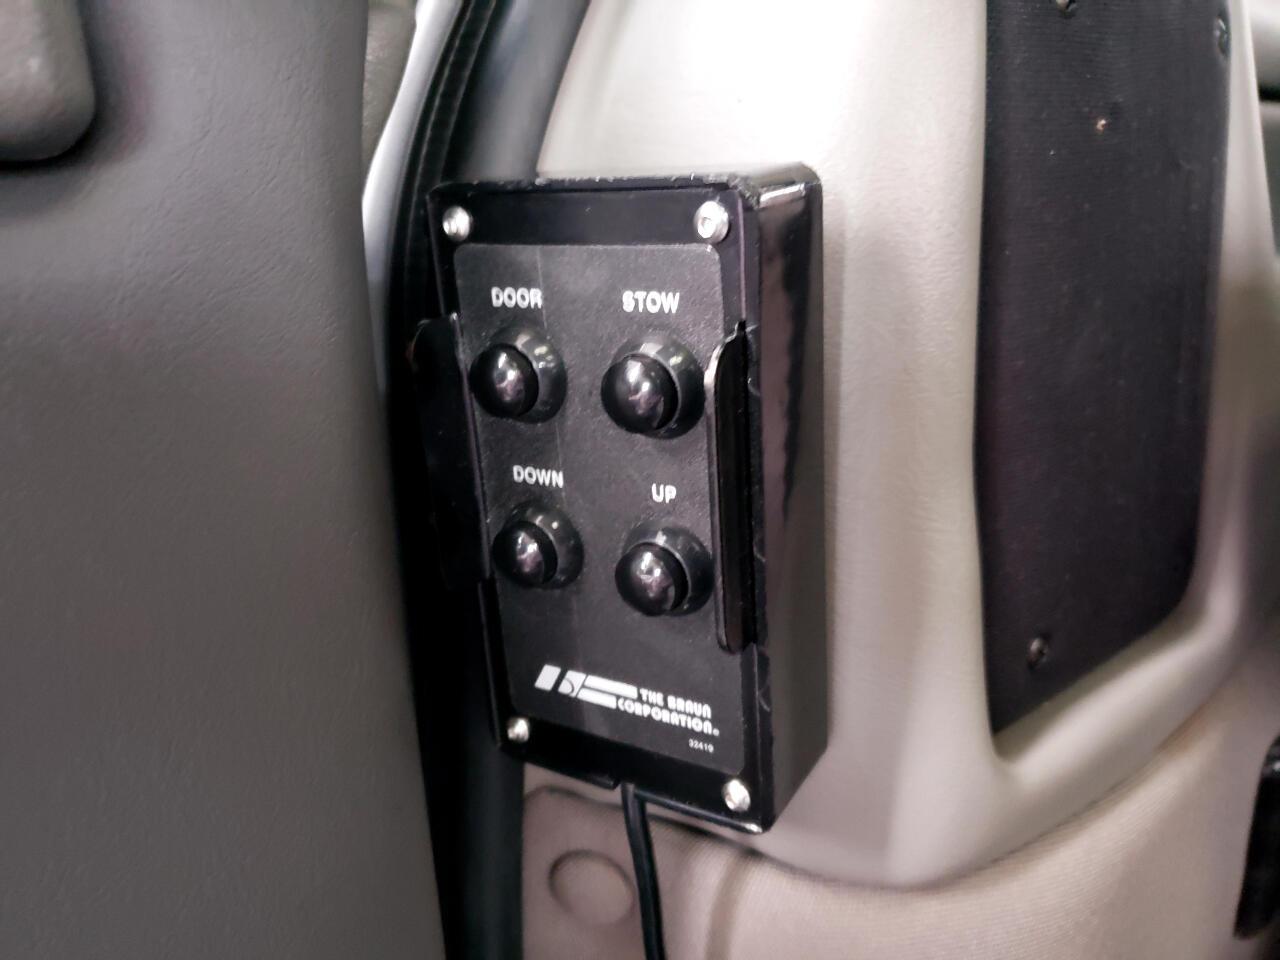 2013 GMC Savana 2500 Extended Handicapped UVL lift Explorer Conver